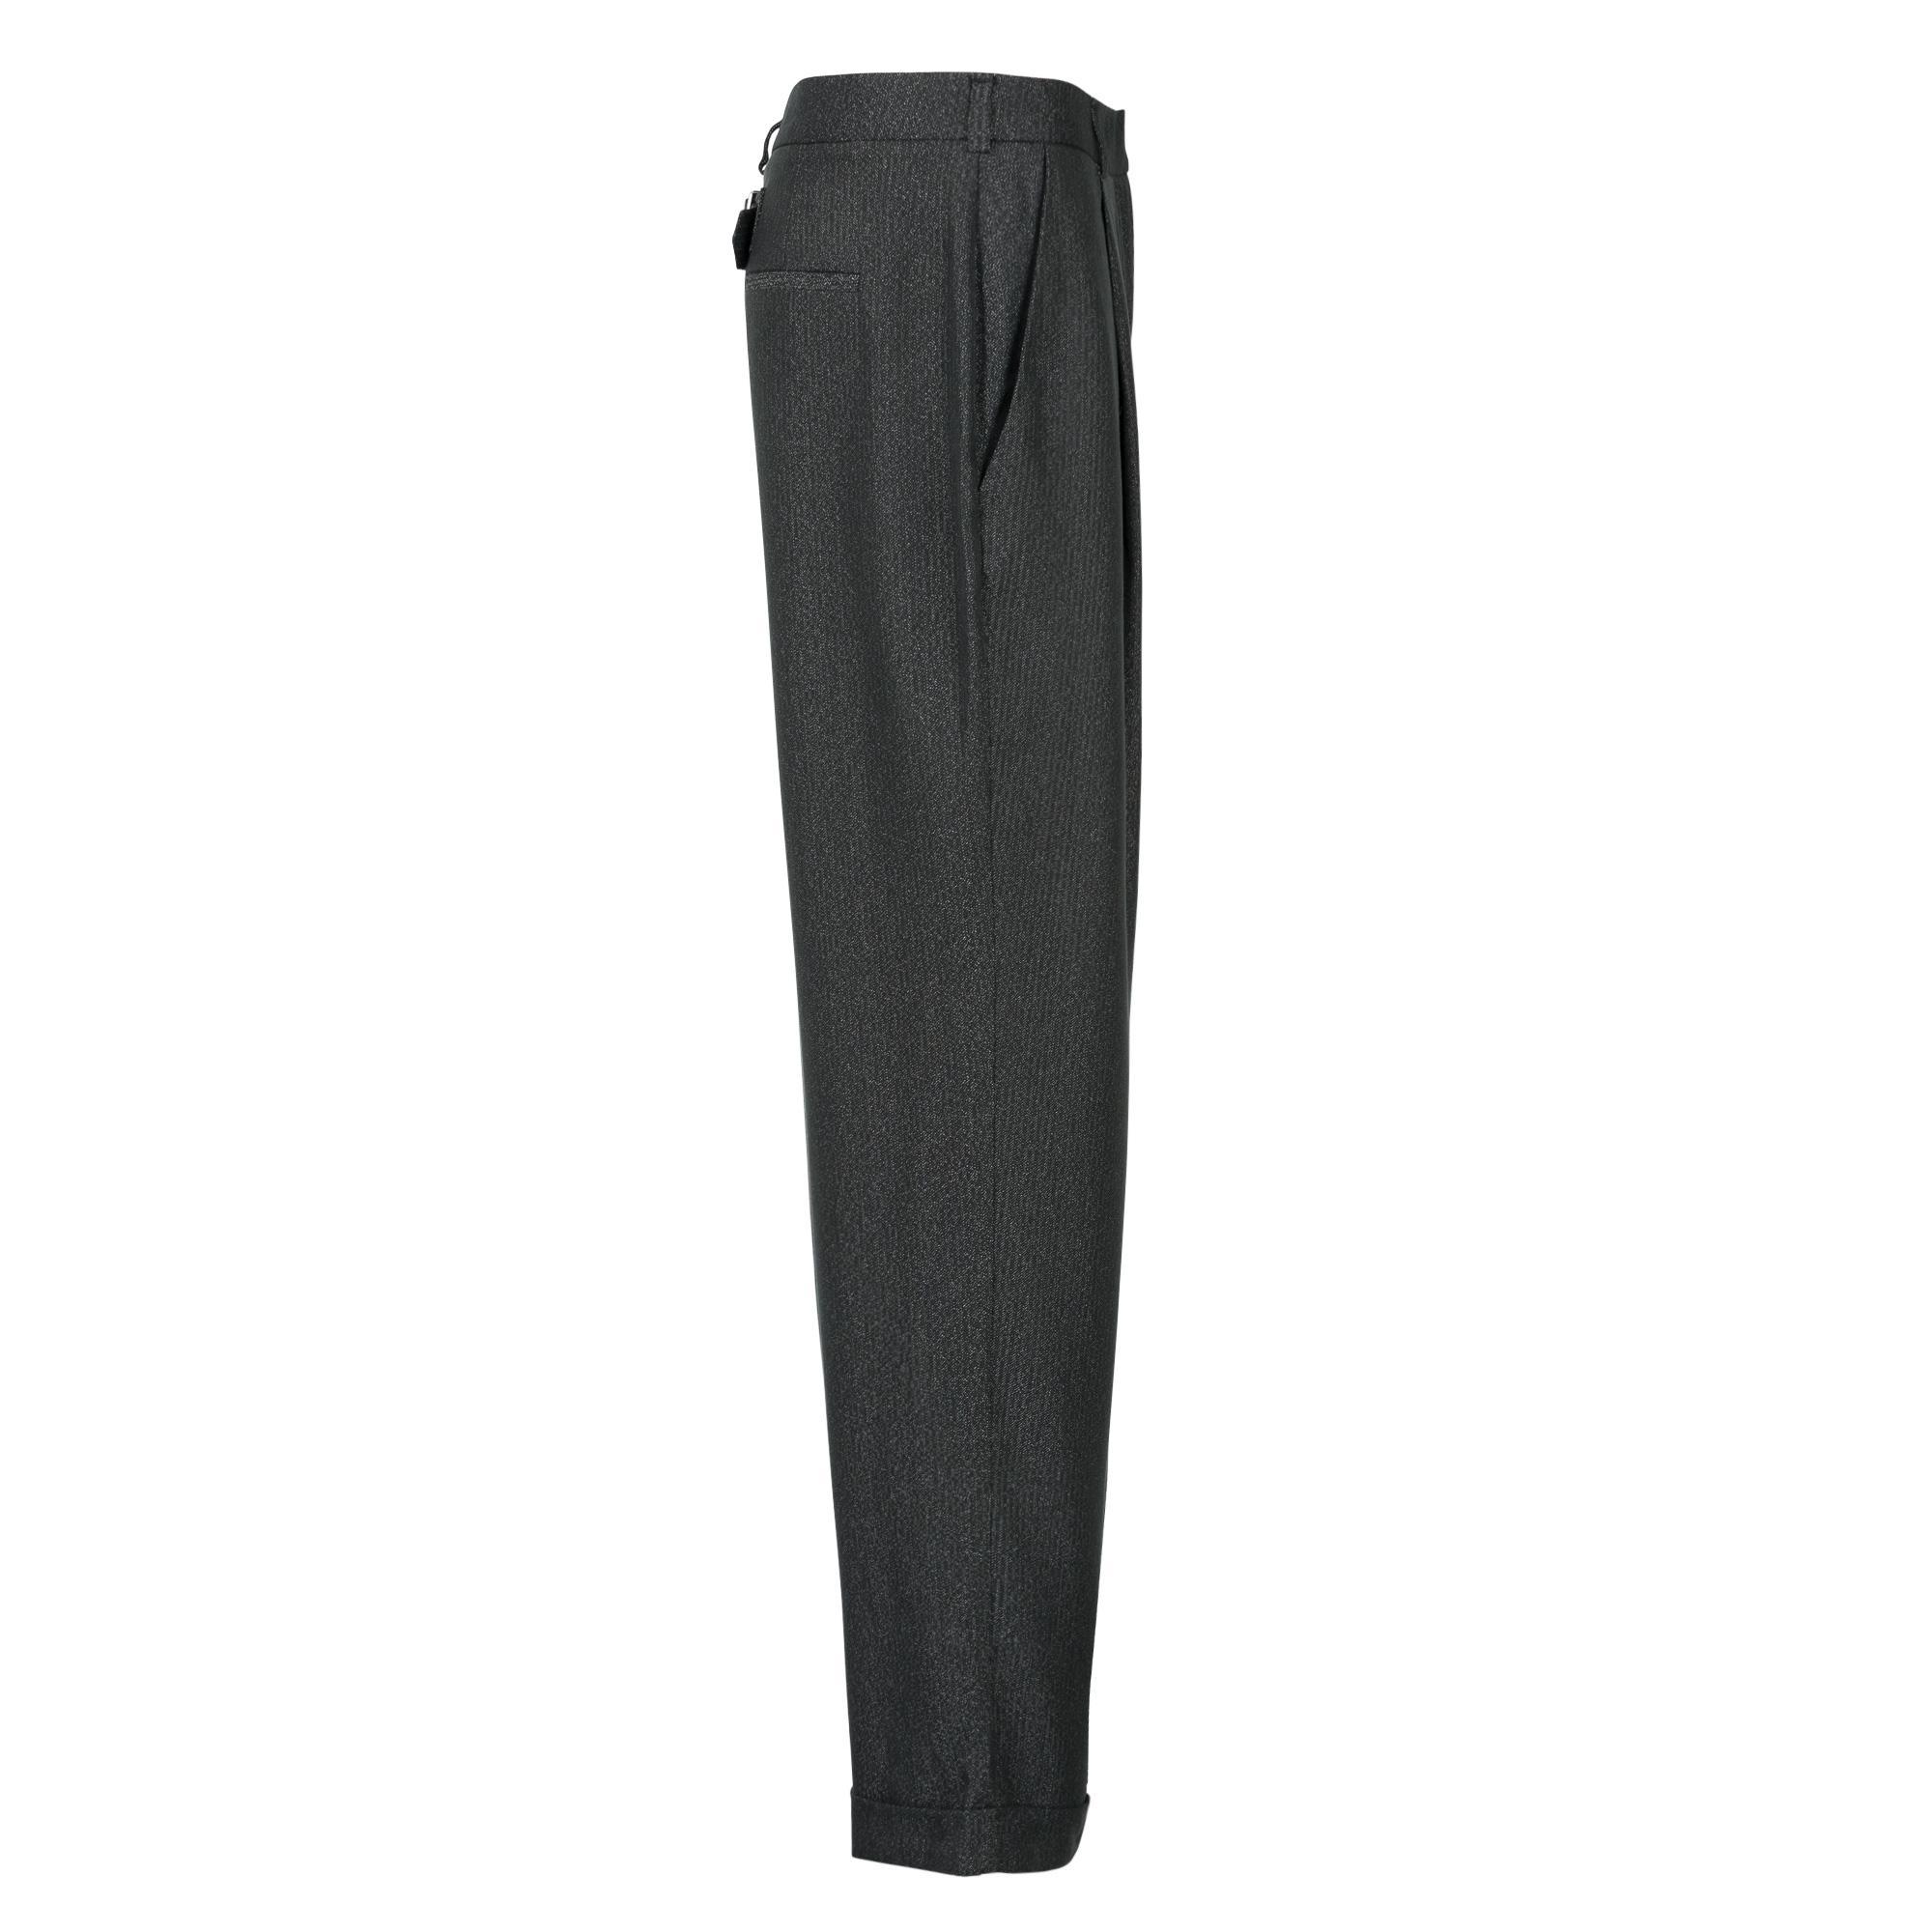 Lyst - Oliver Bonas Anti Relaxed Boyfriend Trousers in Black for Men